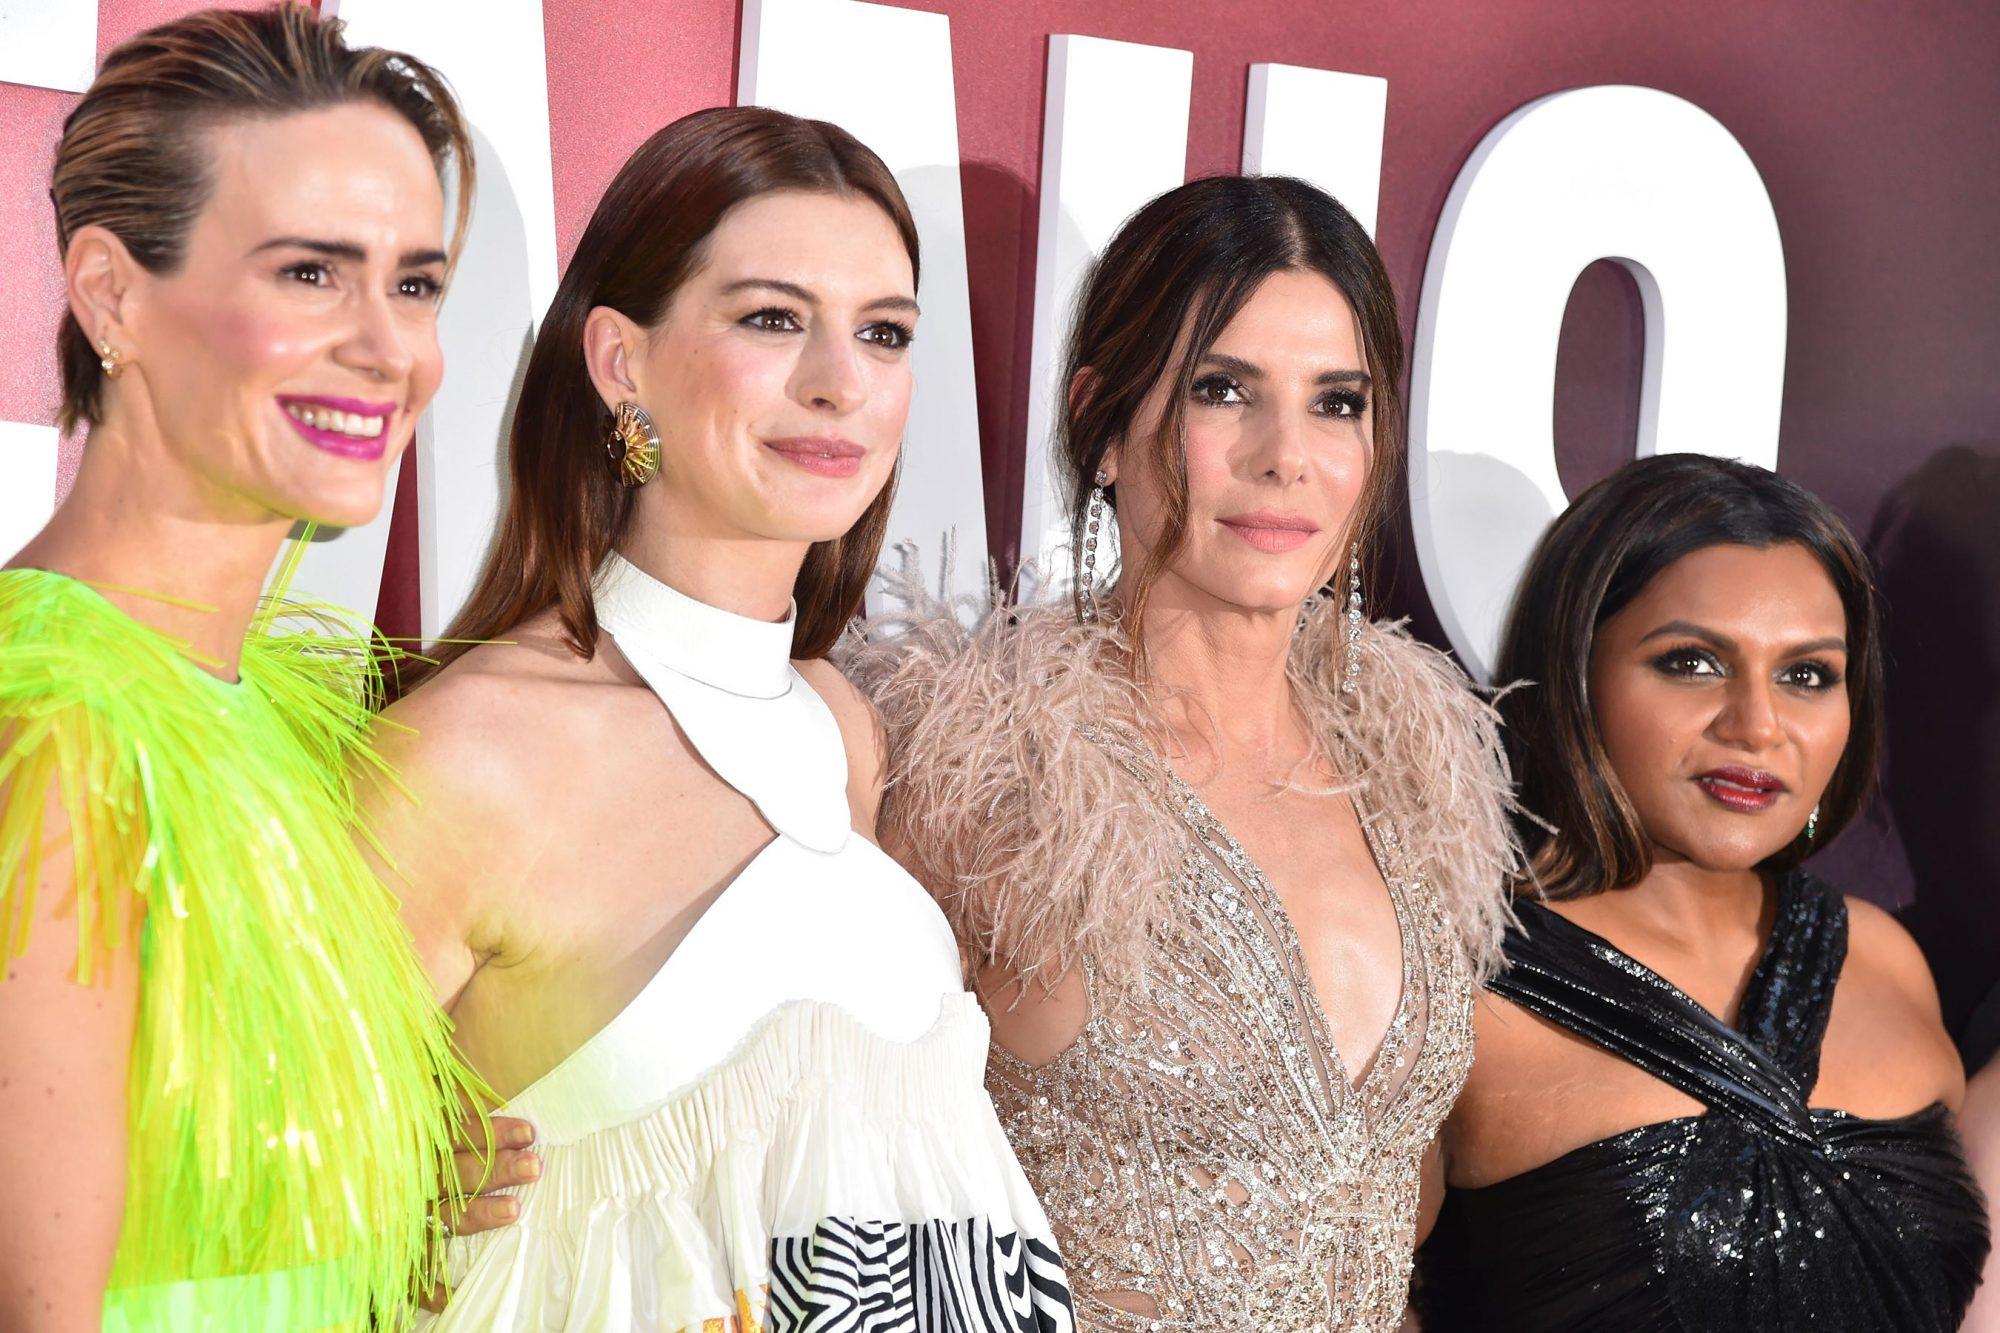 'Ocean's 8' film premiere, Arrivals, New York, USA - 05 Jun 2018